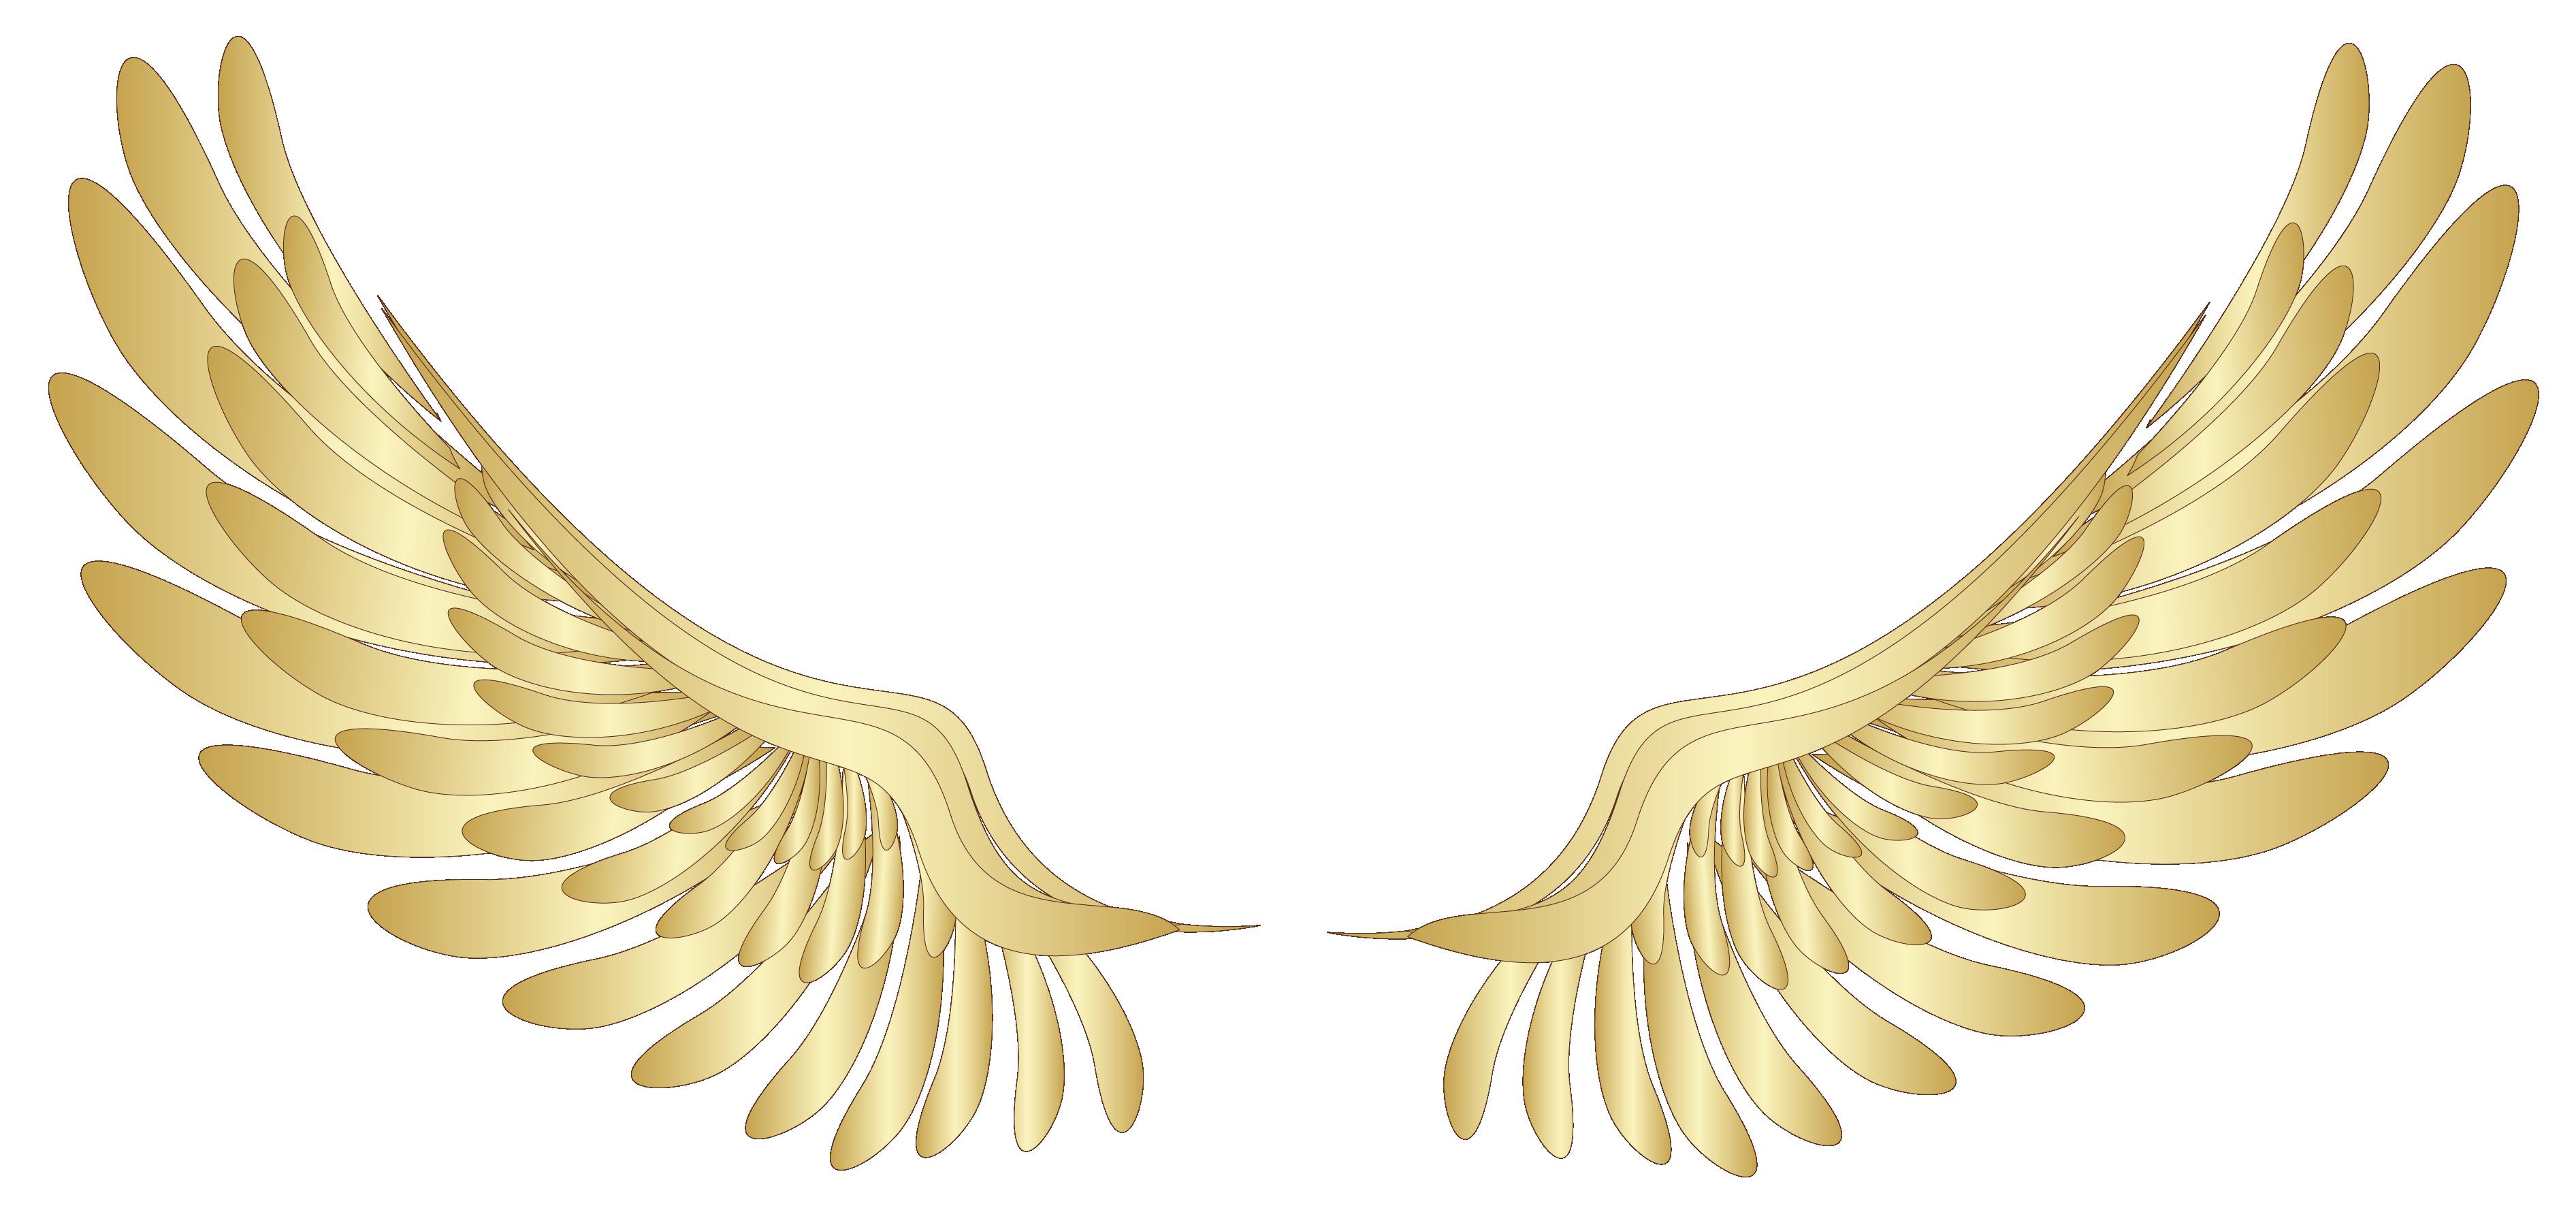 Pin by mohammedosamazain on Wings | Asas de anjo, Asas ...